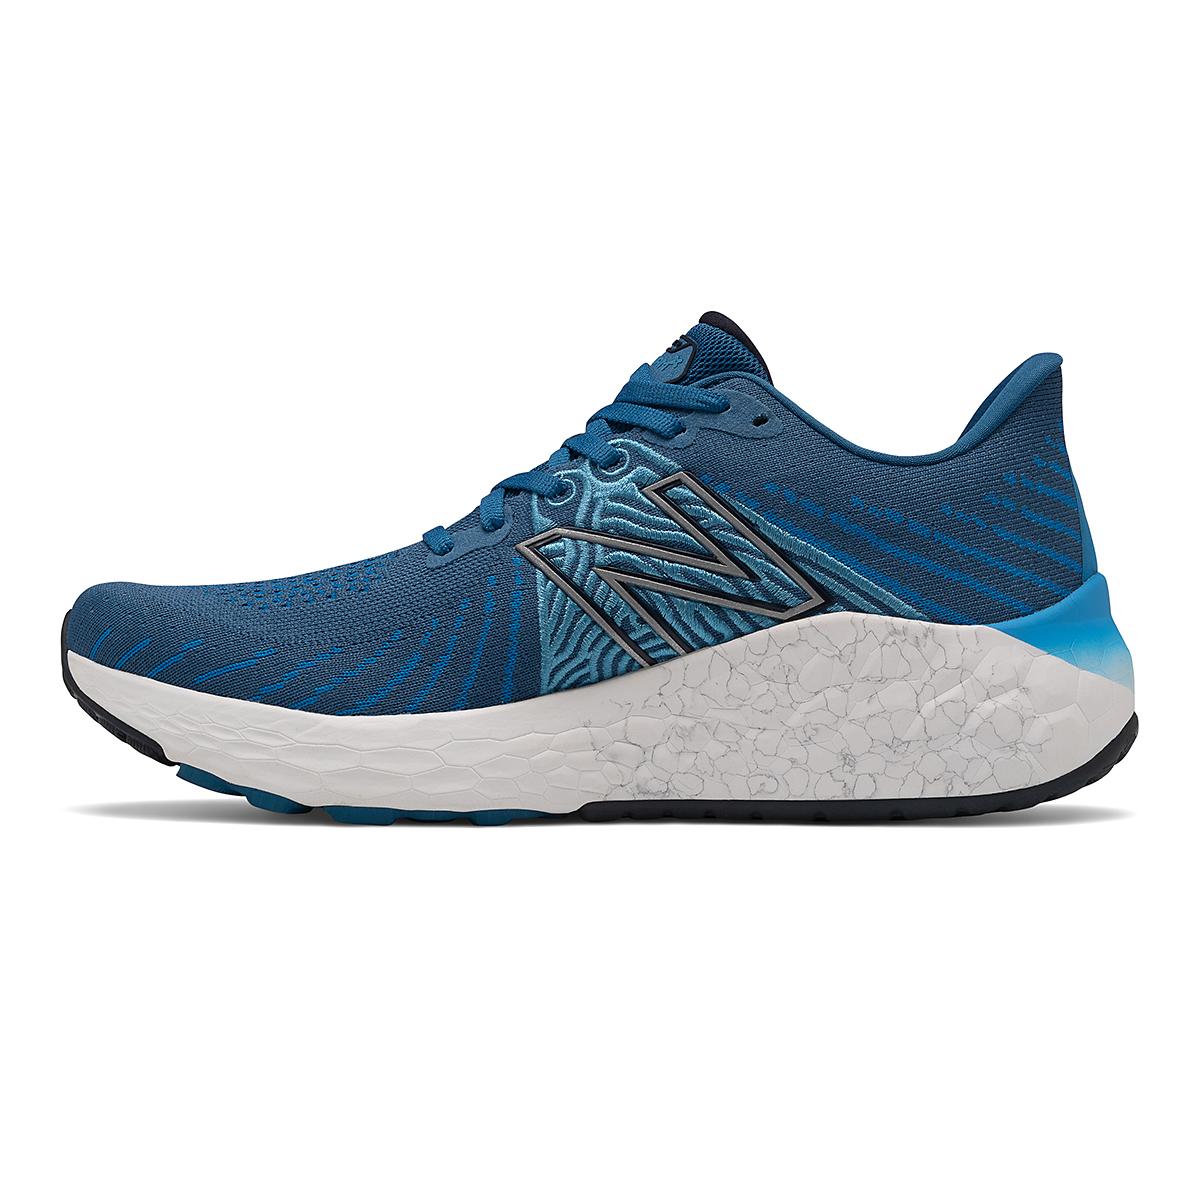 Men's New Balance Fresh Foam X Vongo V5 Running Shoe - Color: Oxygen Blue/Laser Blue - Size: 7 - Width: Wide, Oxygen Blue/Laser Blue, large, image 2